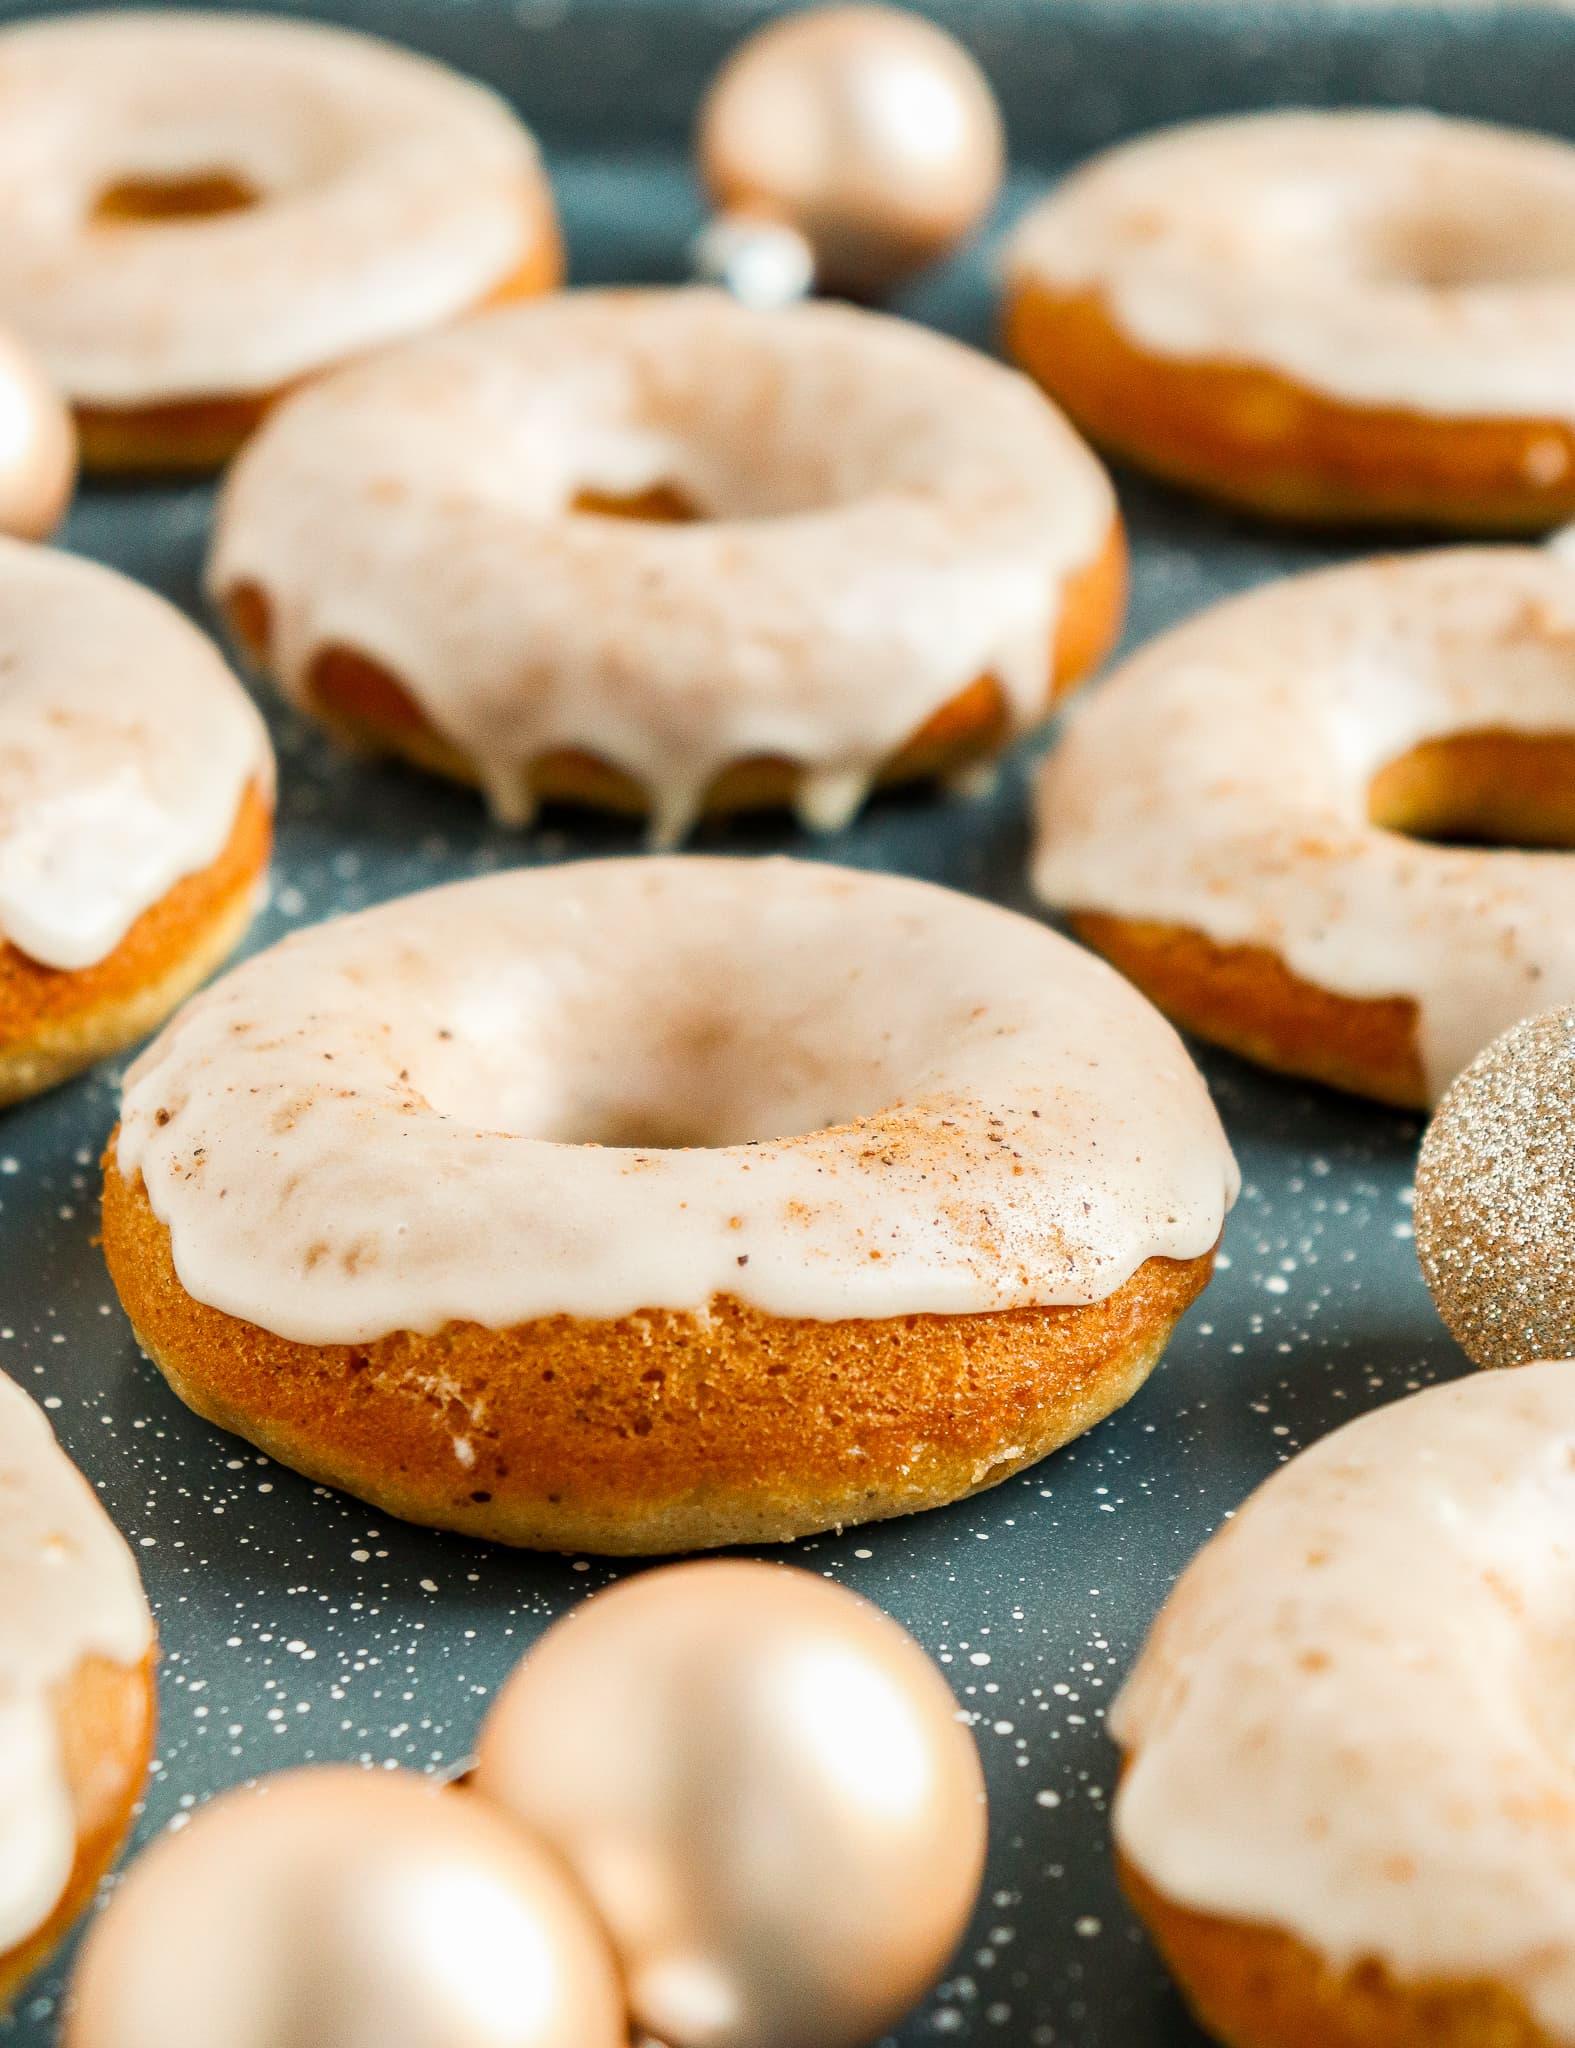 eggnog doughnuts with glaze on top